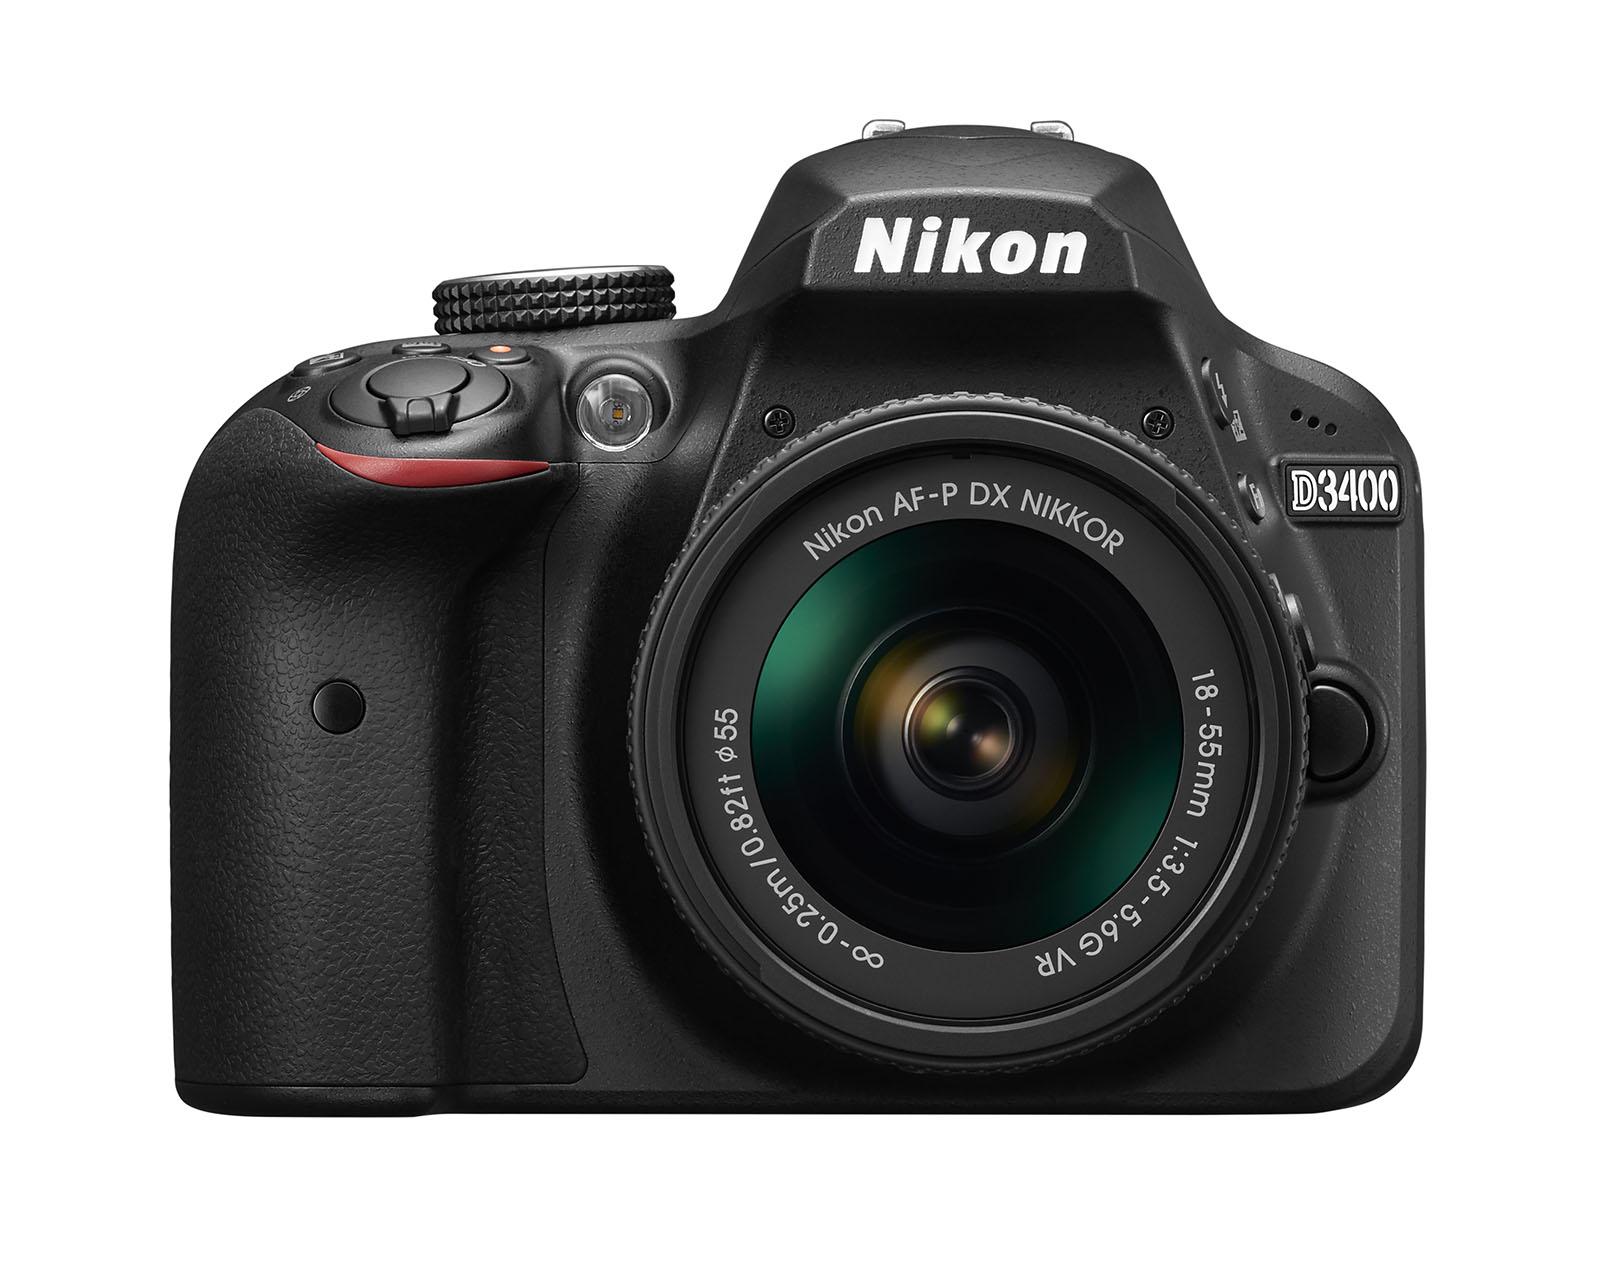 f22-cz-Nikon-D3400_BK_18_55_VR_front